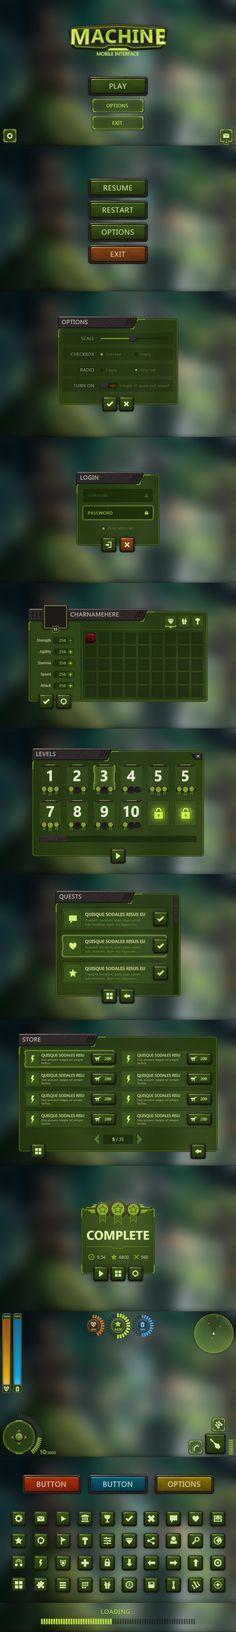 Machine Mobile UI